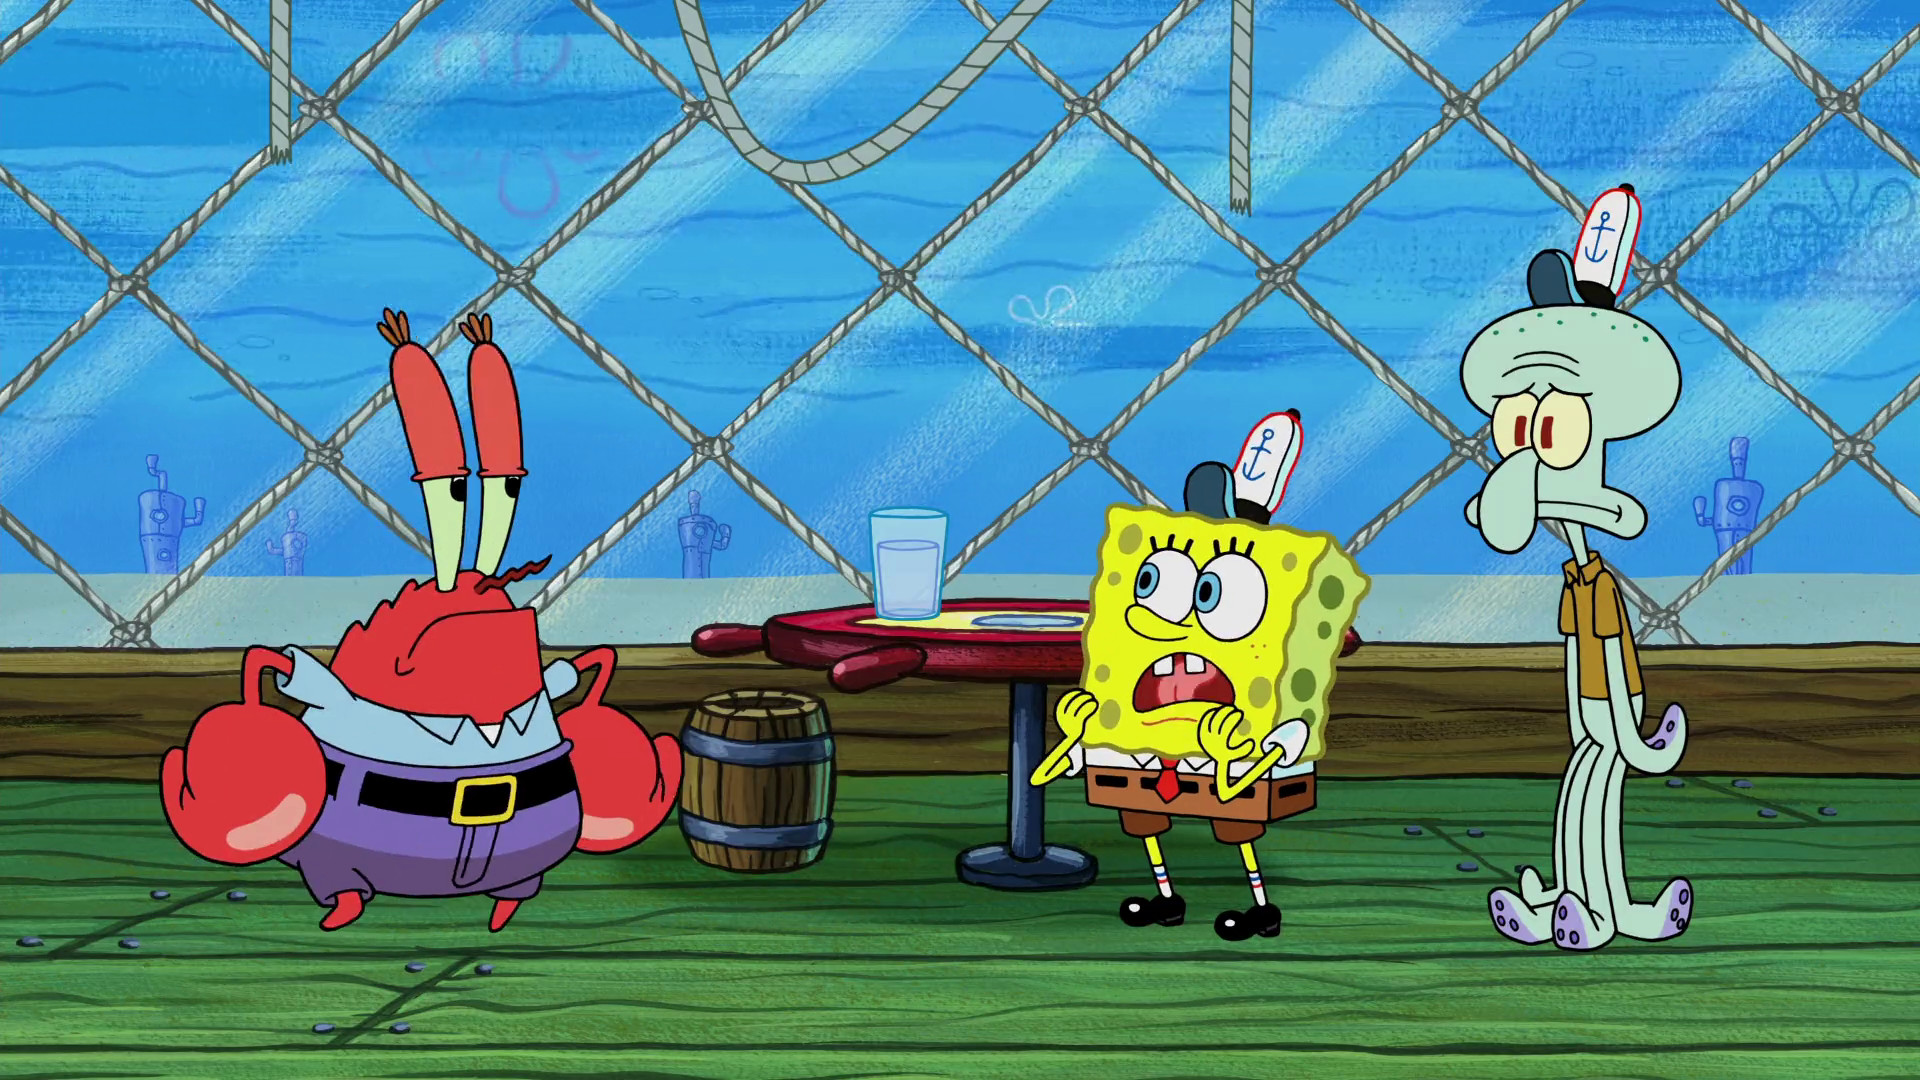 Res: 1920x1080, Mr Krabs, Spongebob and Squidward wallpaper